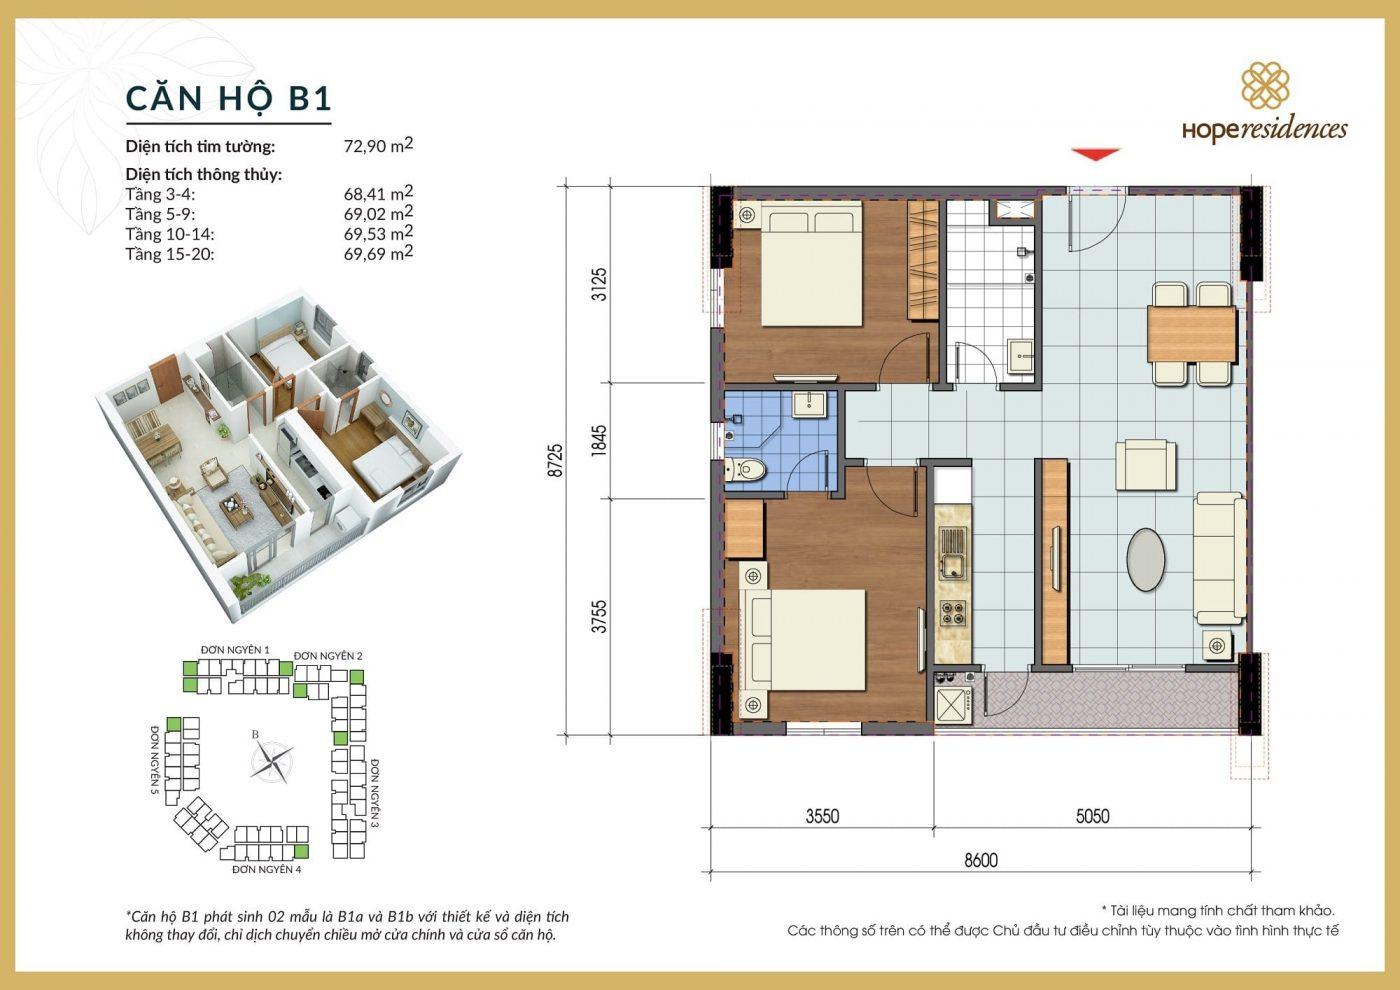 mat bang thiet ke can ho b1 hope residences